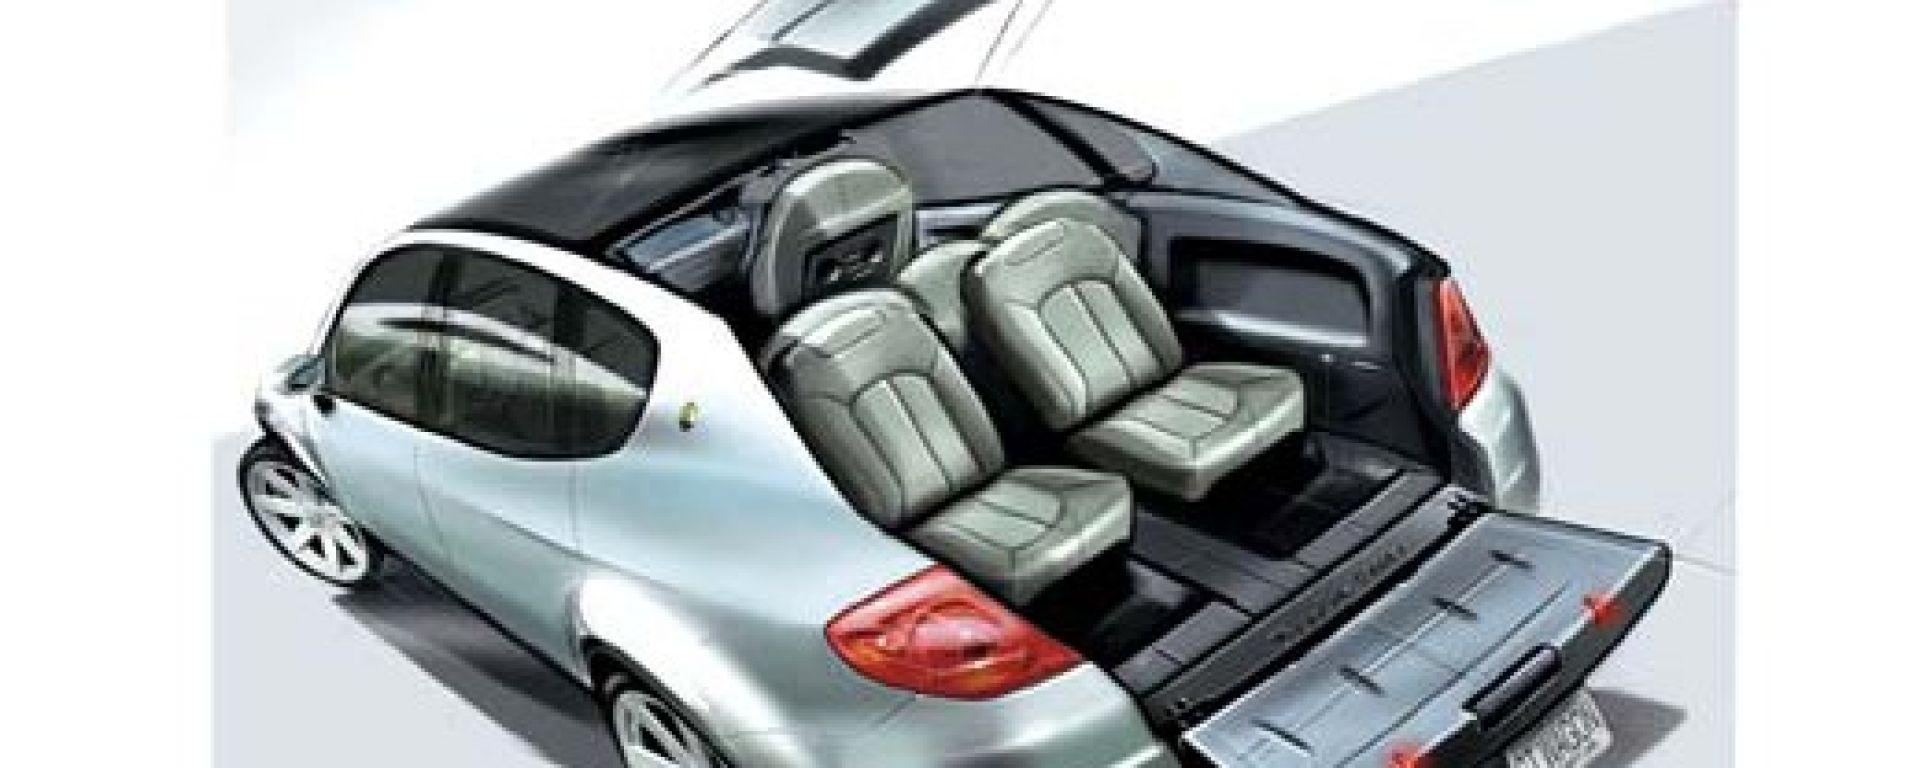 Maserati Kubang: le nuove immagini